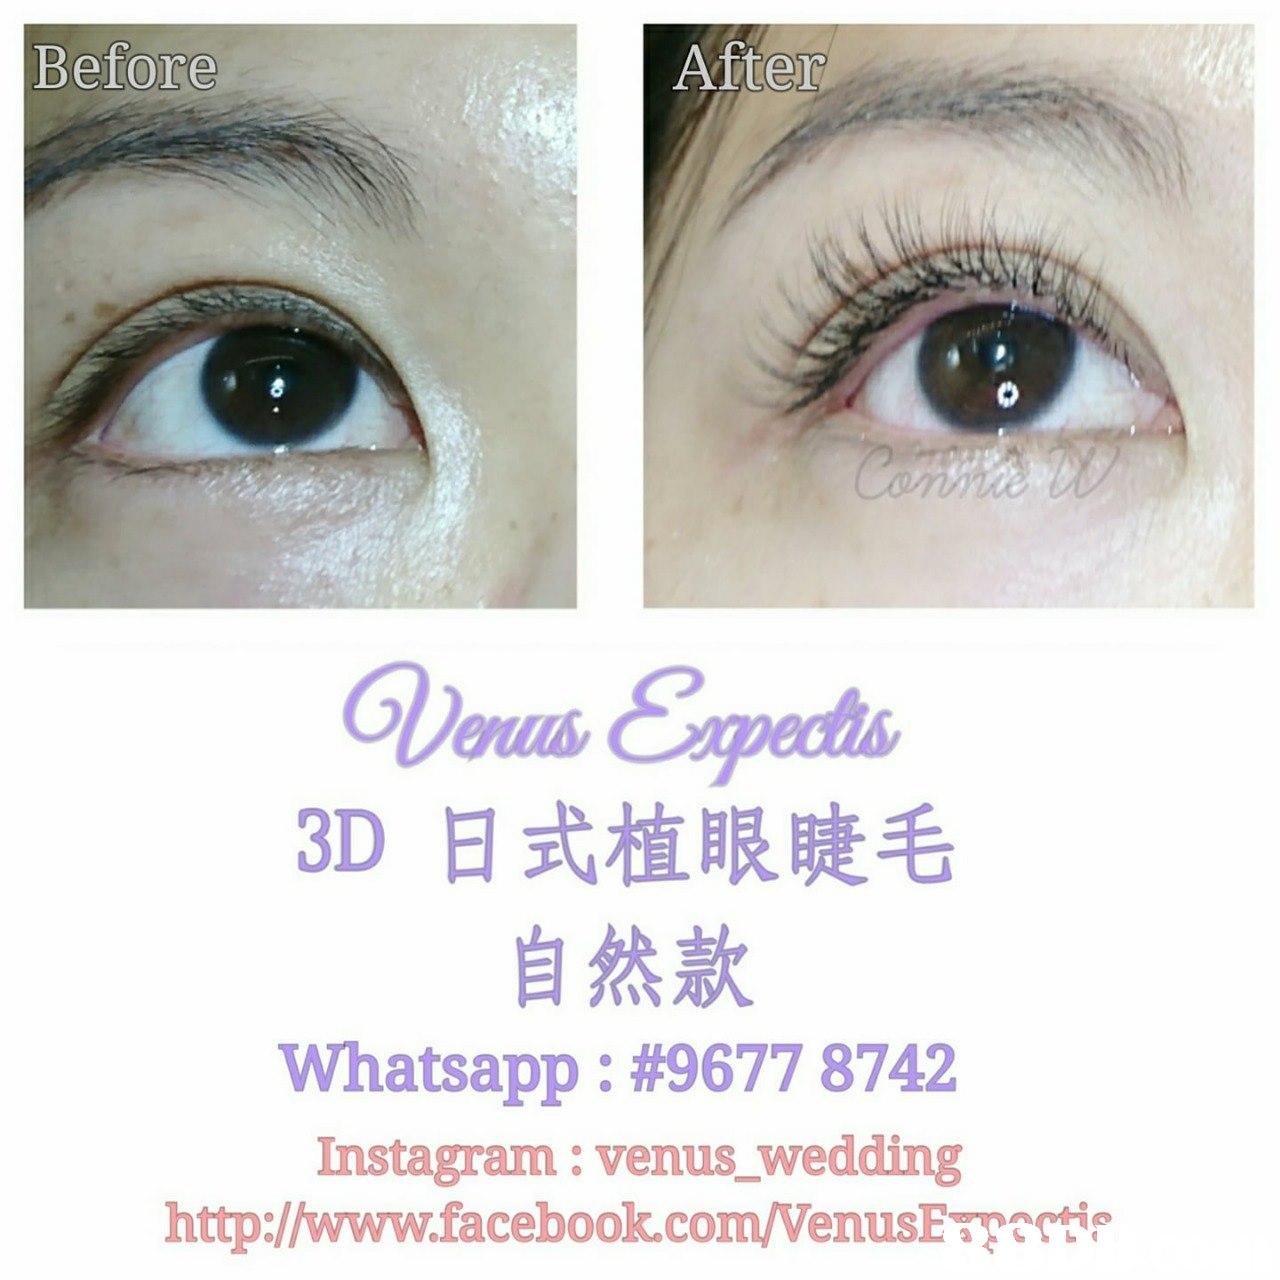 Before er 3D 日式植眼睫毛 自然款 Whatsapp : #9677 8742 Instagram: venus_wedding htup//wwwmn/Venusr facebook.co  eyebrow,eyelash,eye,forehead,cheek